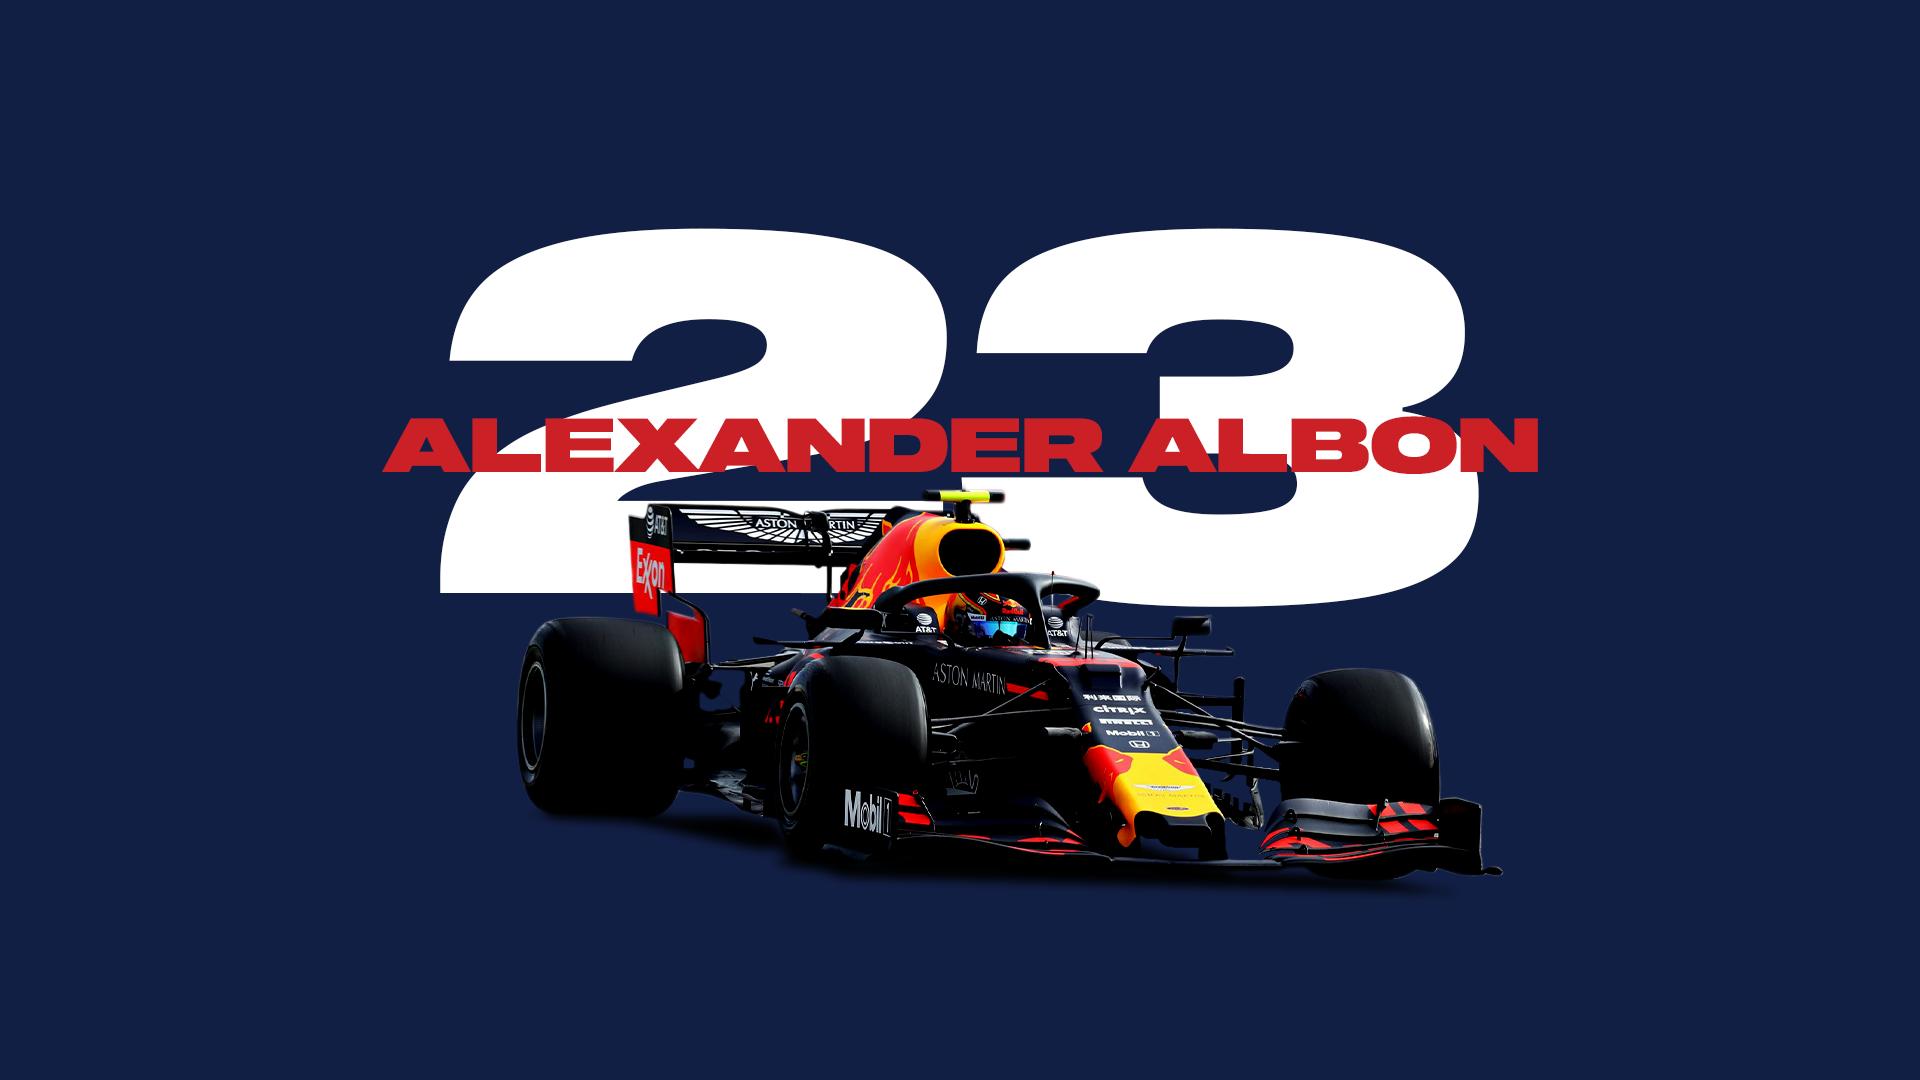 Formula 1 Alexander Albon 2020 Hd Wallpaper Background Image 1920x1080 Id 1079839 Wallpaper Abyss